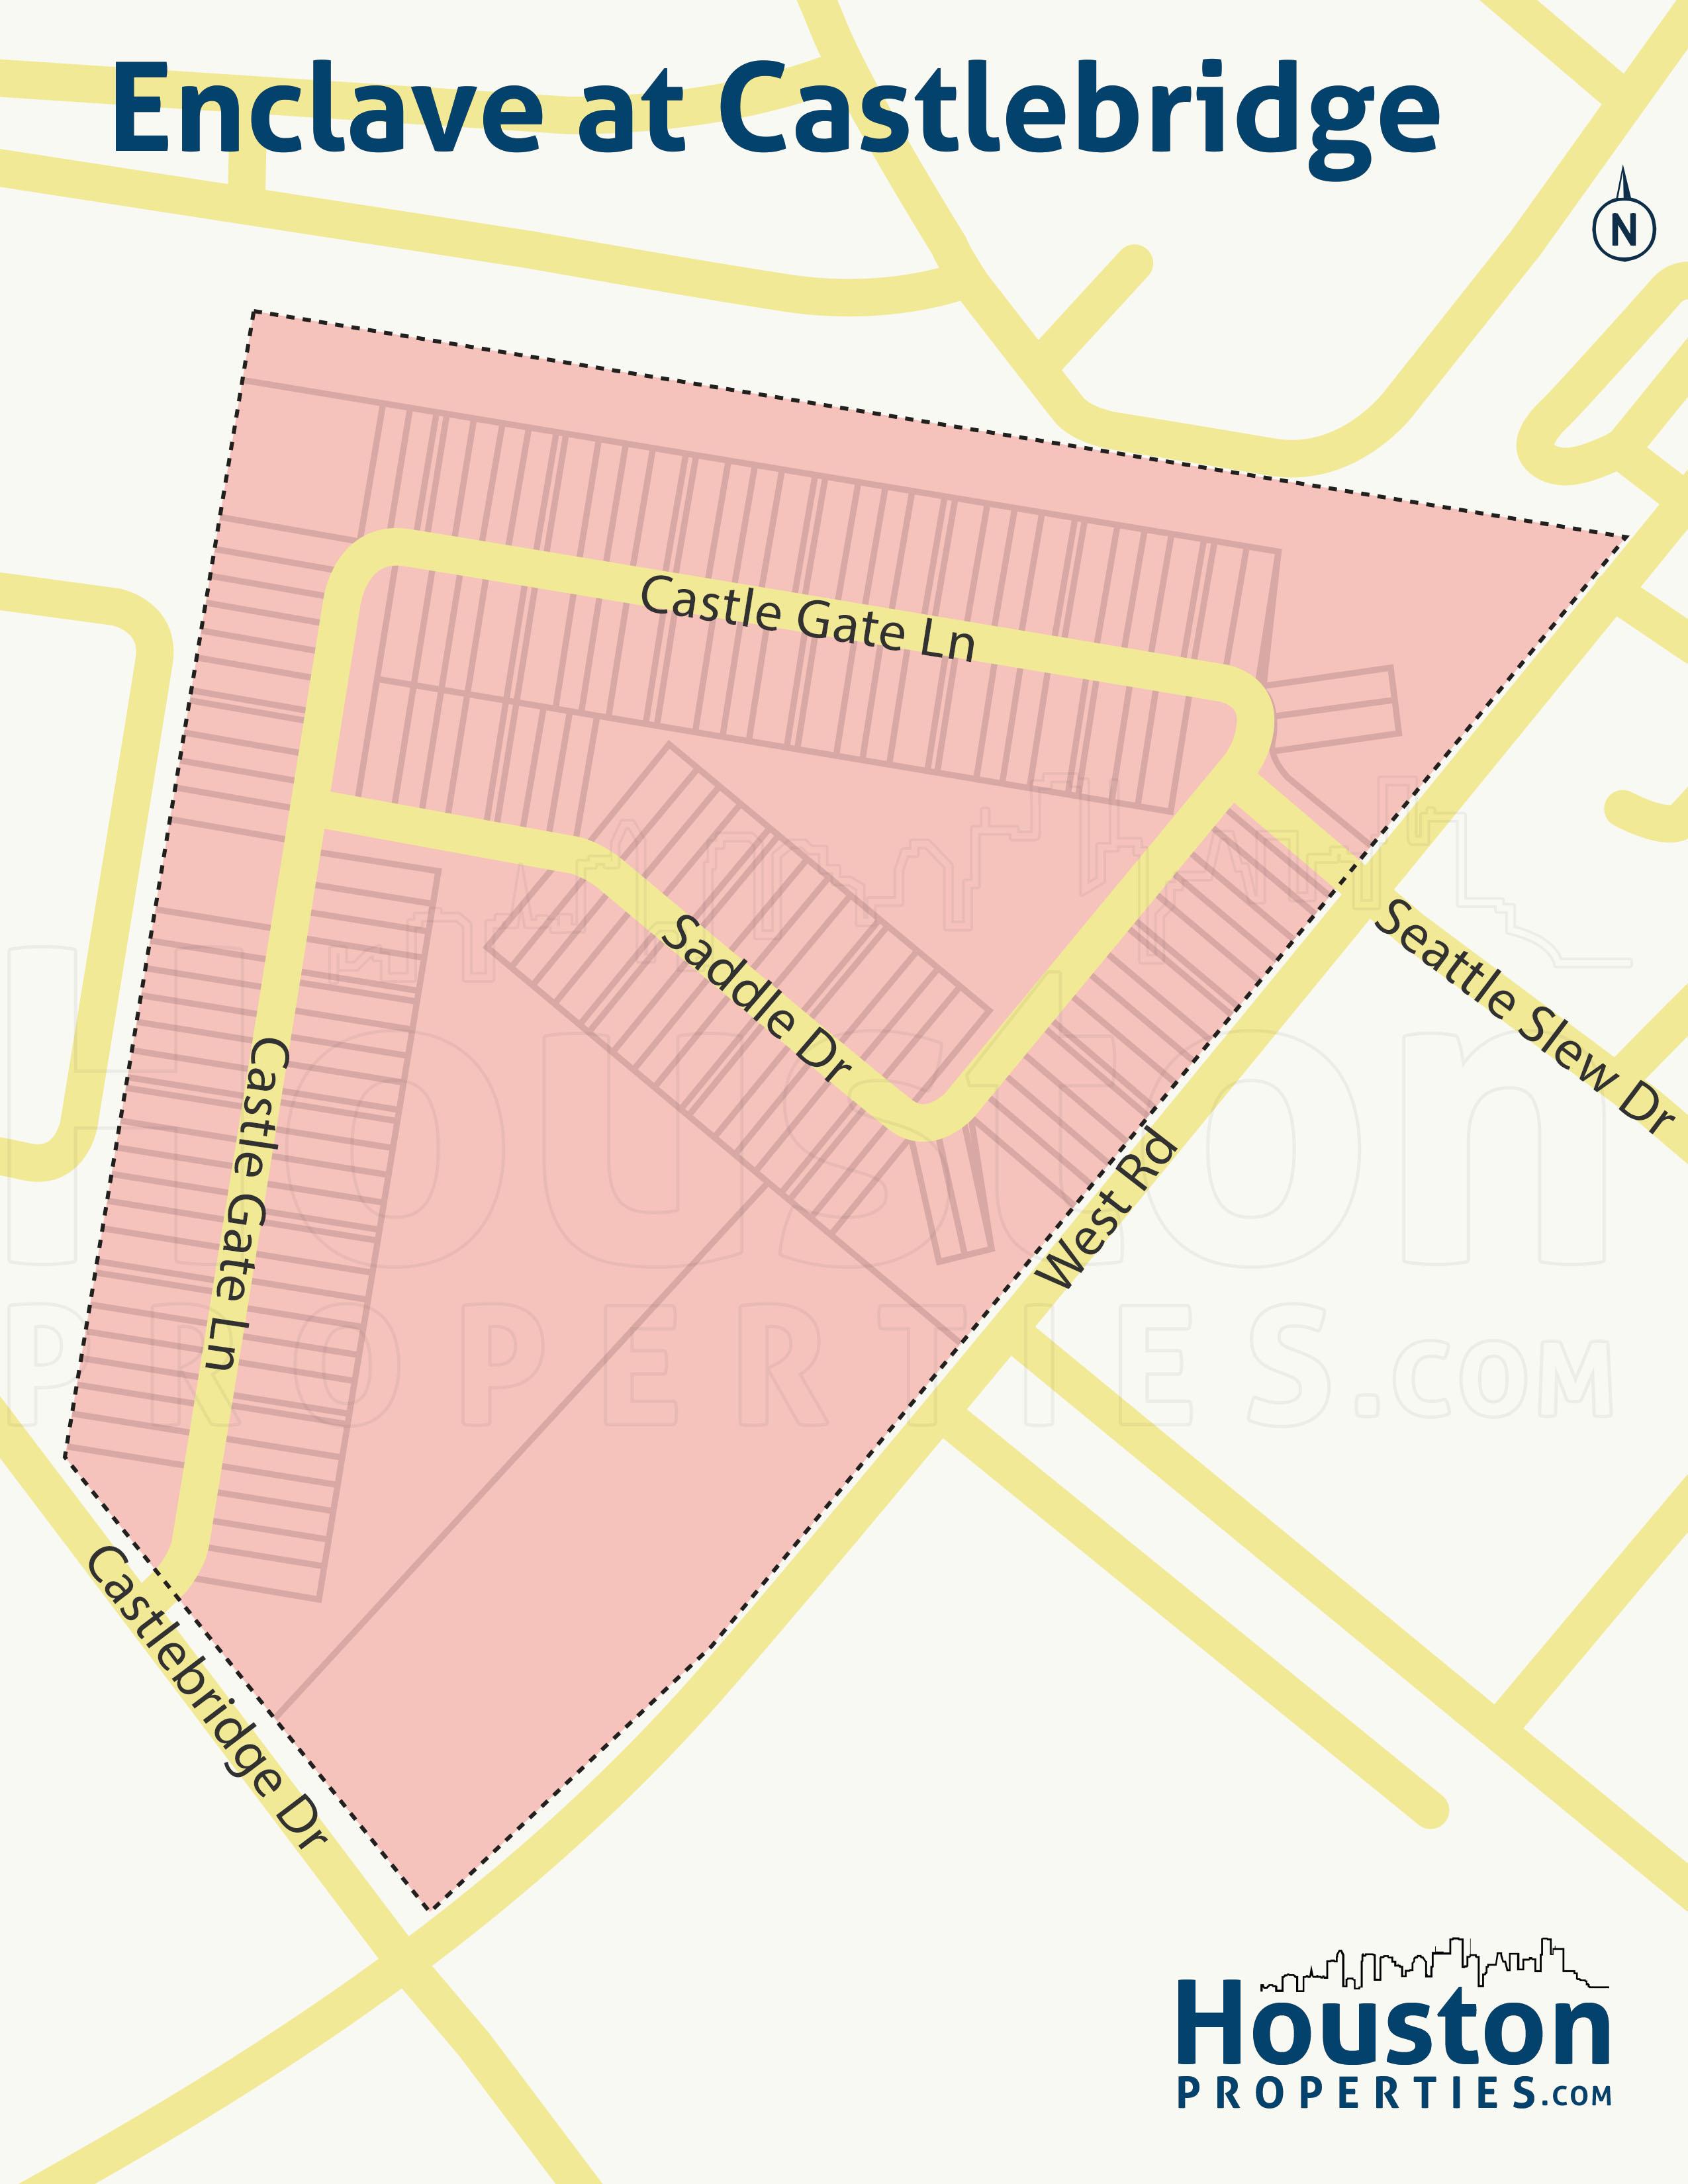 Enclave at Castlebridge neighborhood map